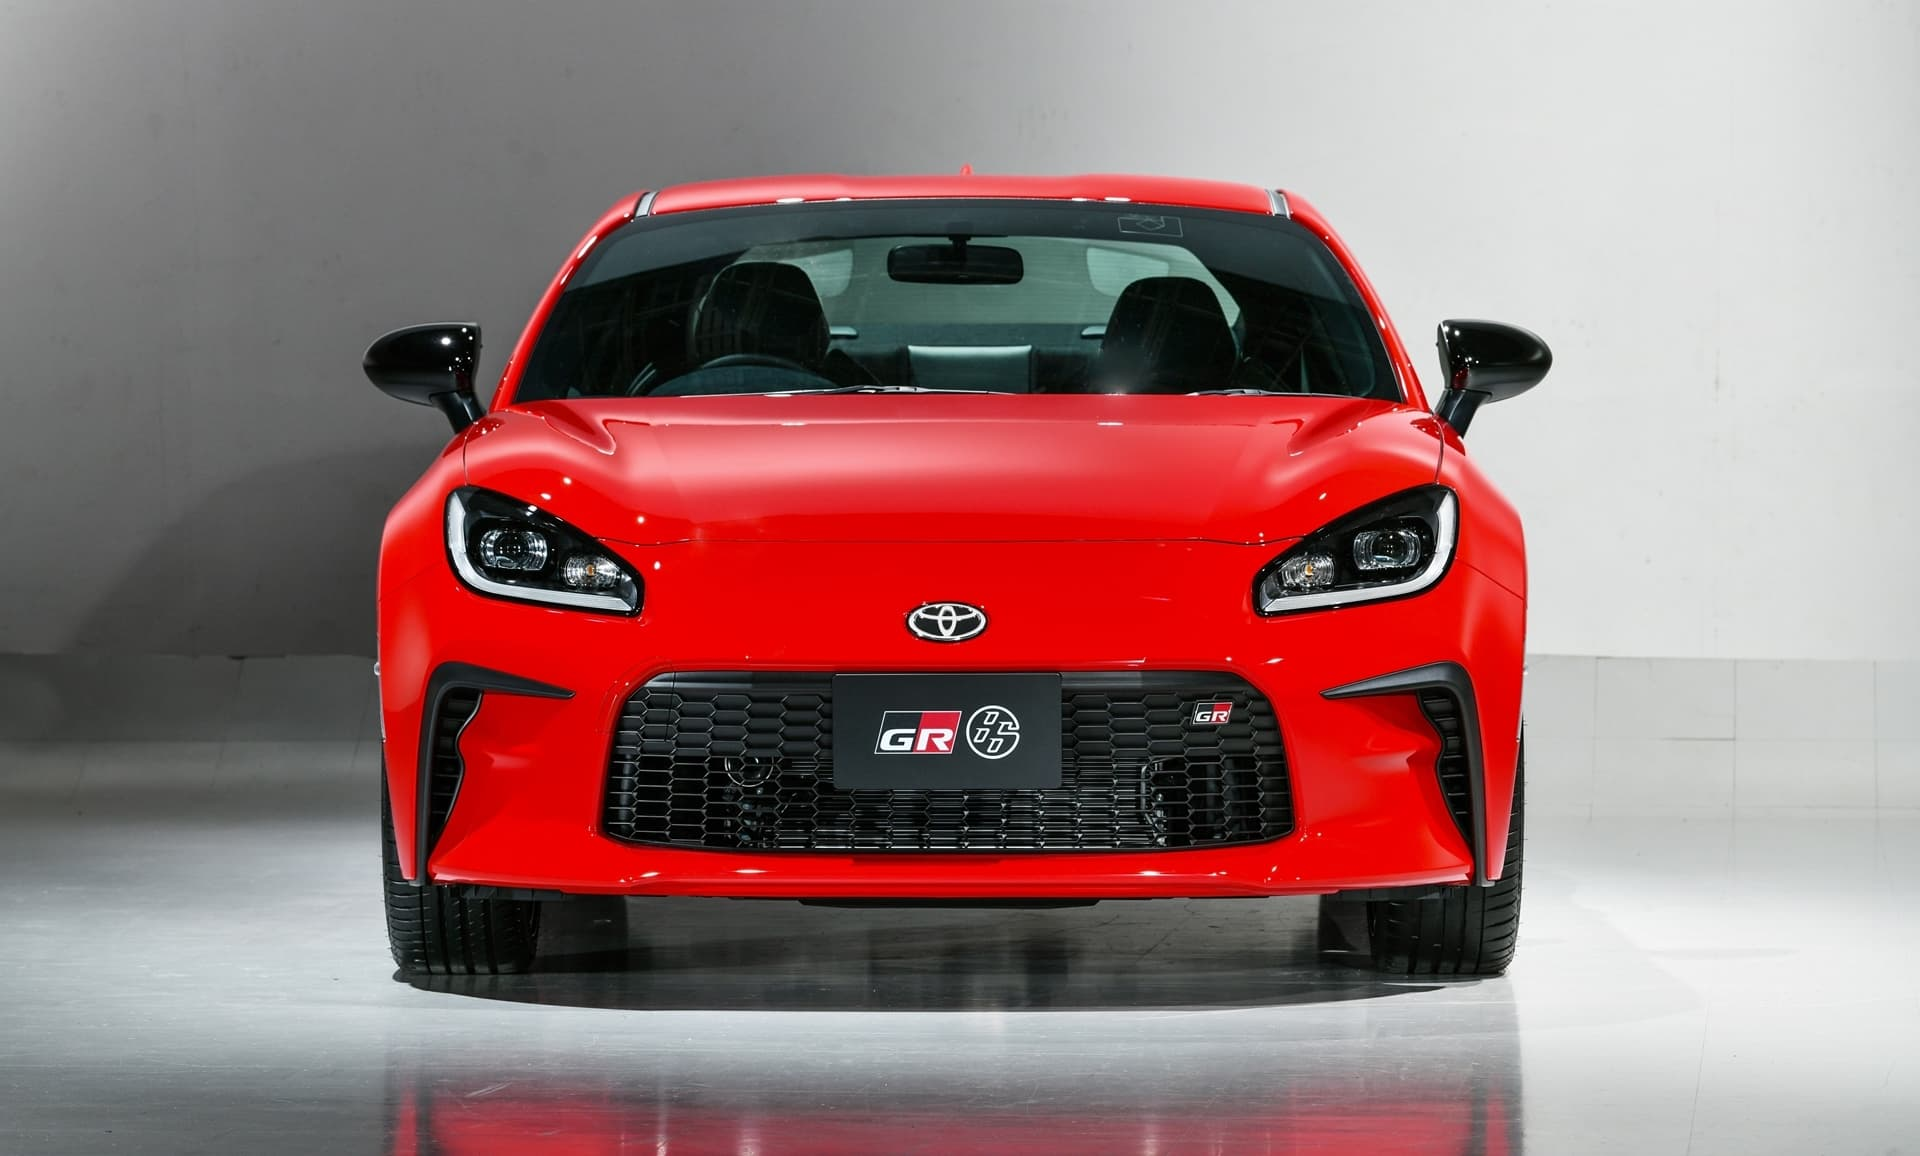 Toyota Gr86 2022 Rojo Frontal 0421 002